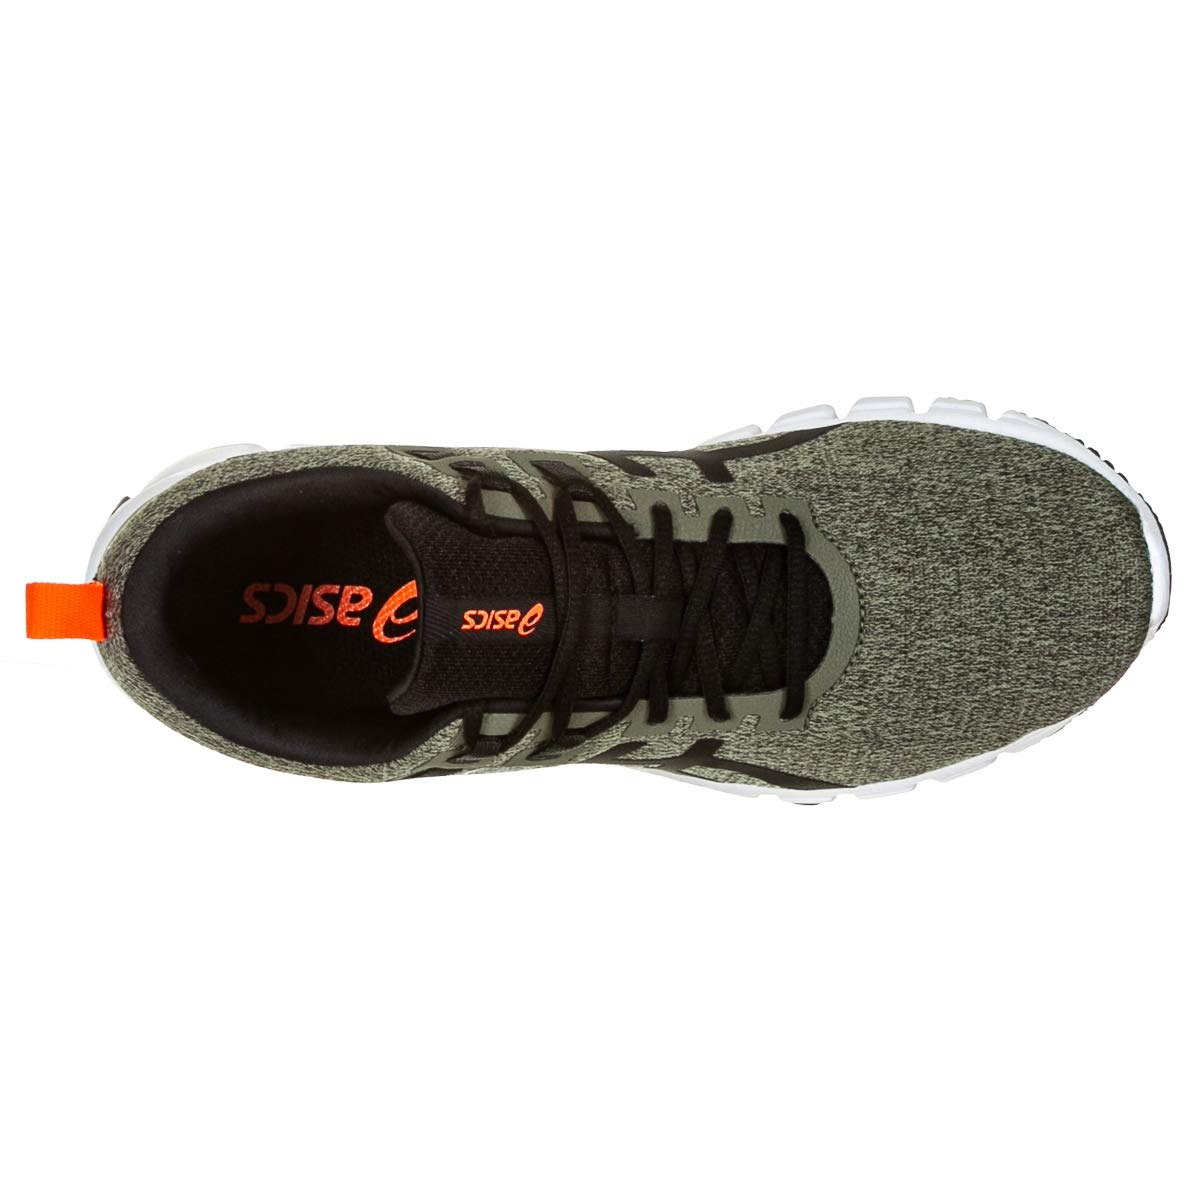 zapatos ninos asics 727